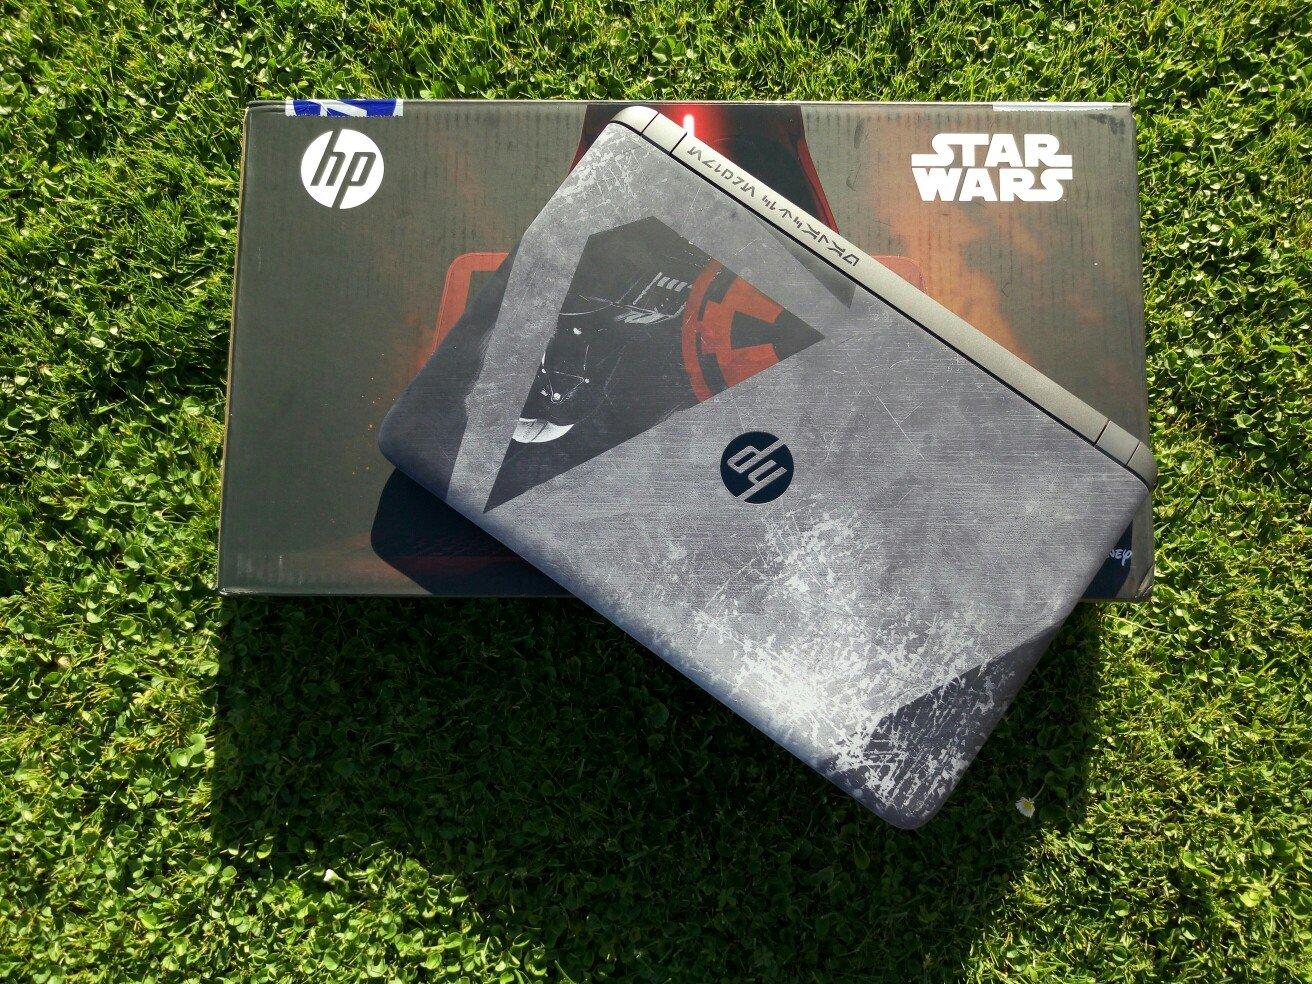 HP-Notebook-Star-Wars-Edition-44